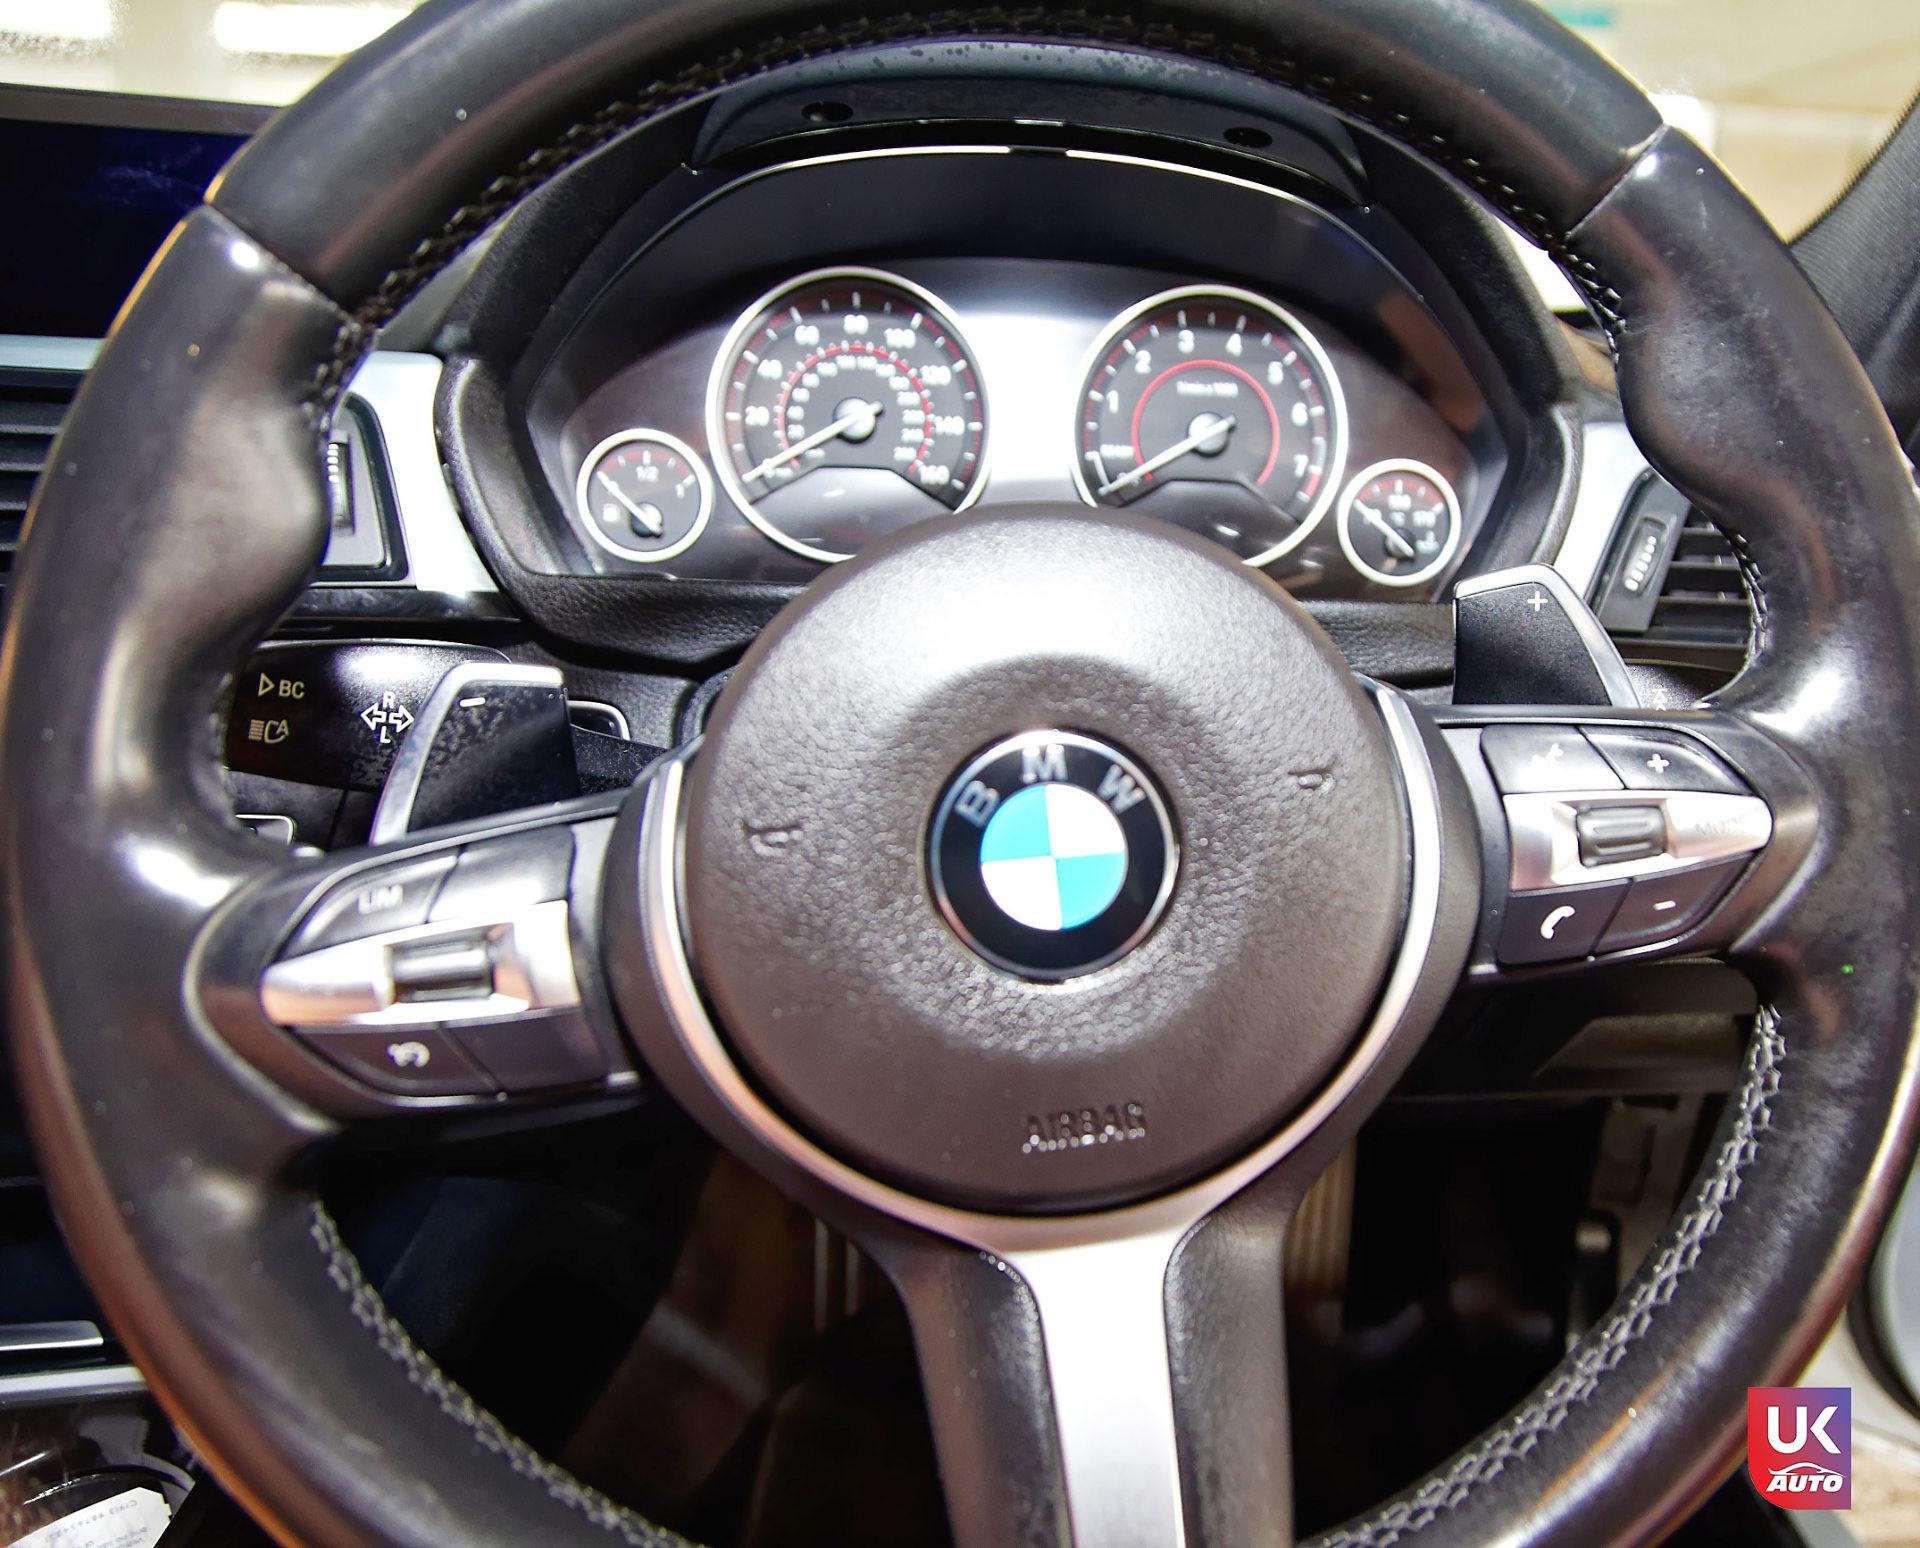 Bmw 335I IMPORT F30 eric drouet import bmw occasion rhd mandataire bmw angleterre11 DxO - IMPORTATION BMW 335 I FELICITATION A ERIC DROUET BMW VOITURE SPORTIVE UK